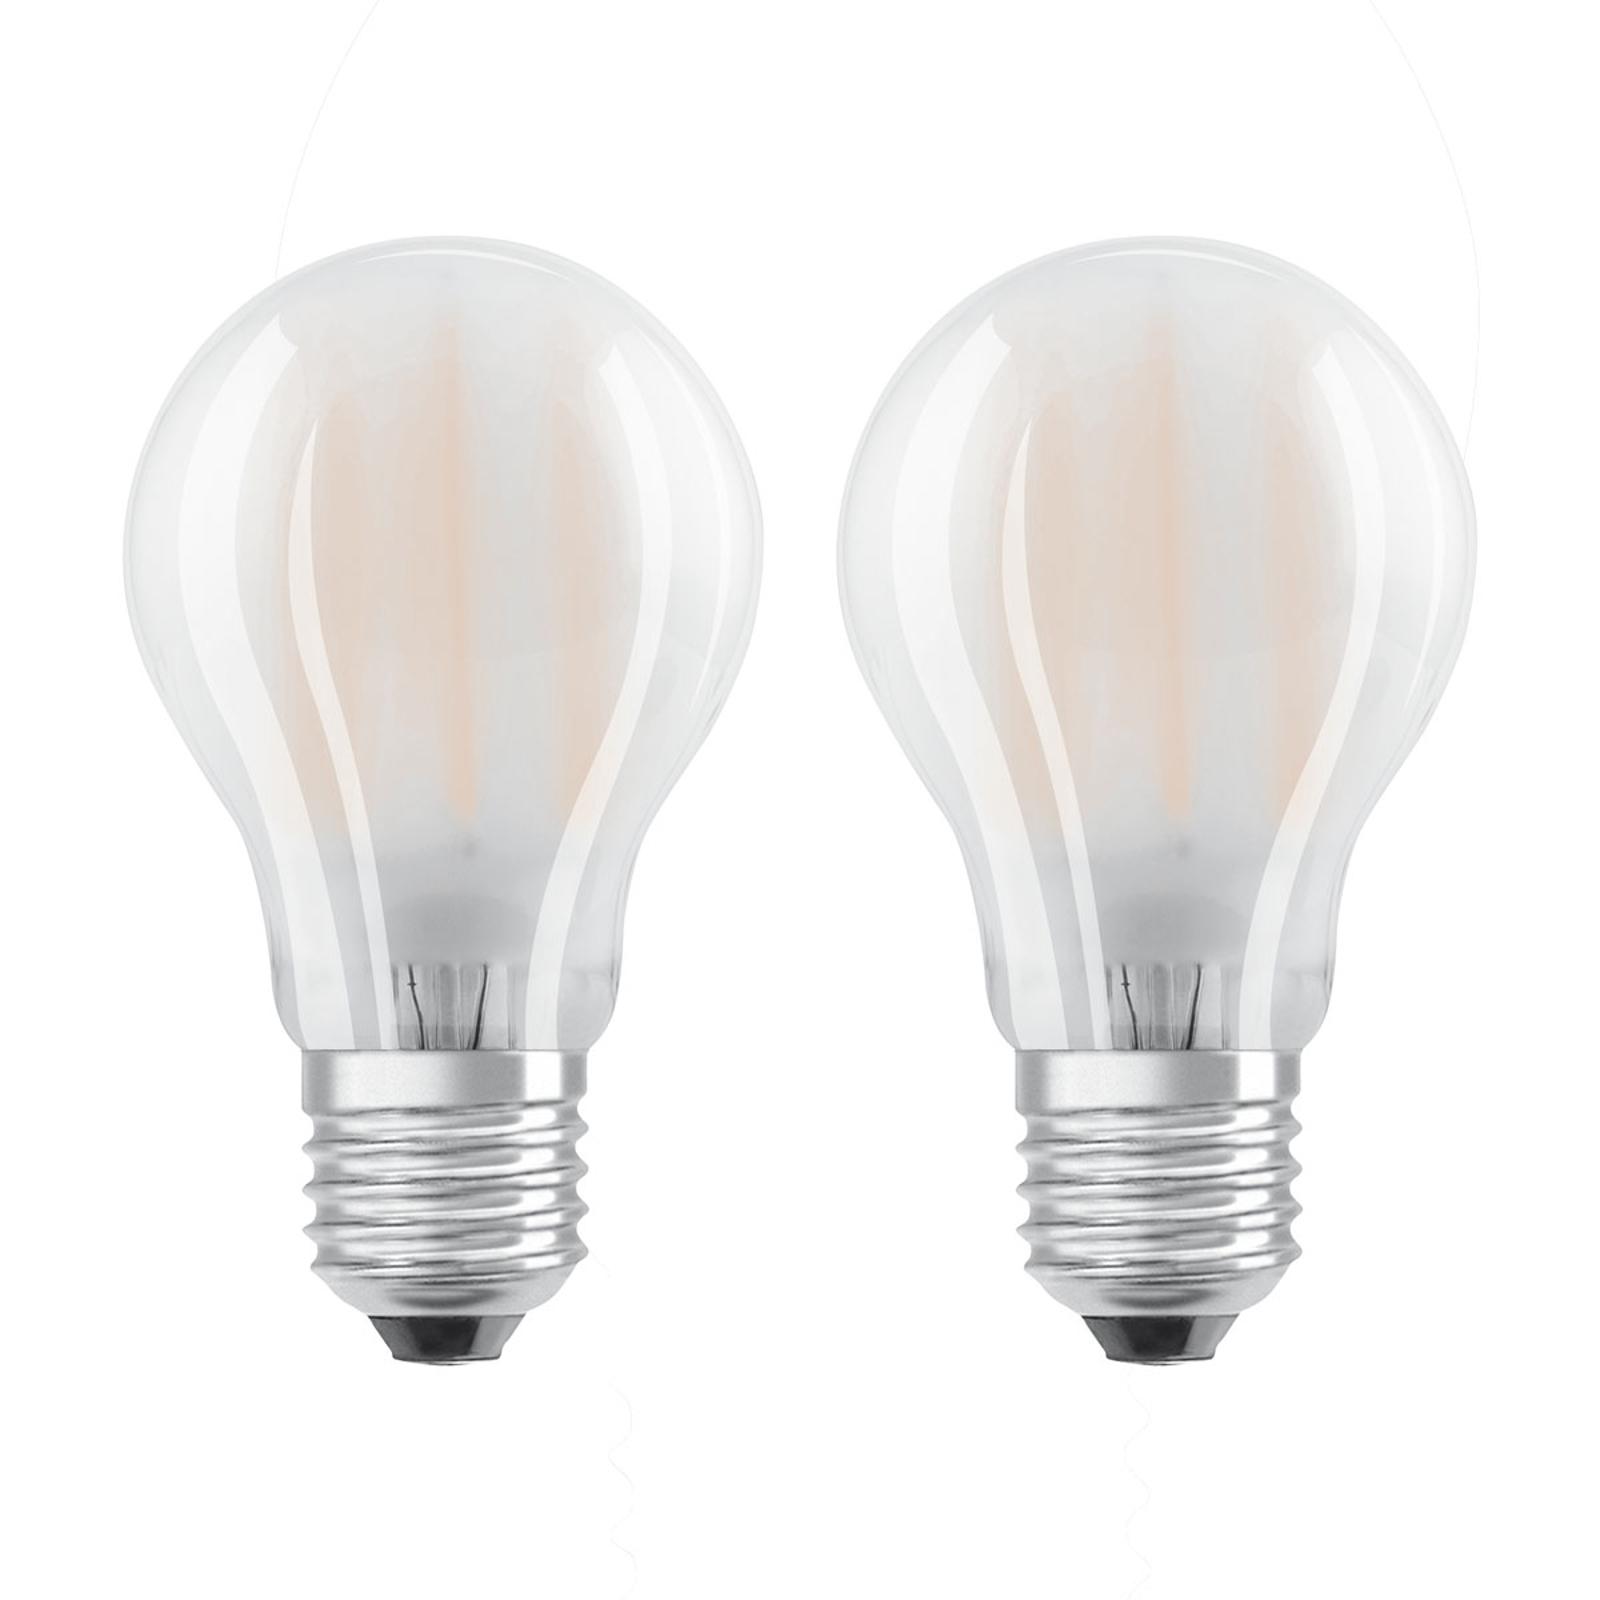 OSRAM LED-Lampe E27 7W warmweiß im 2er-Set